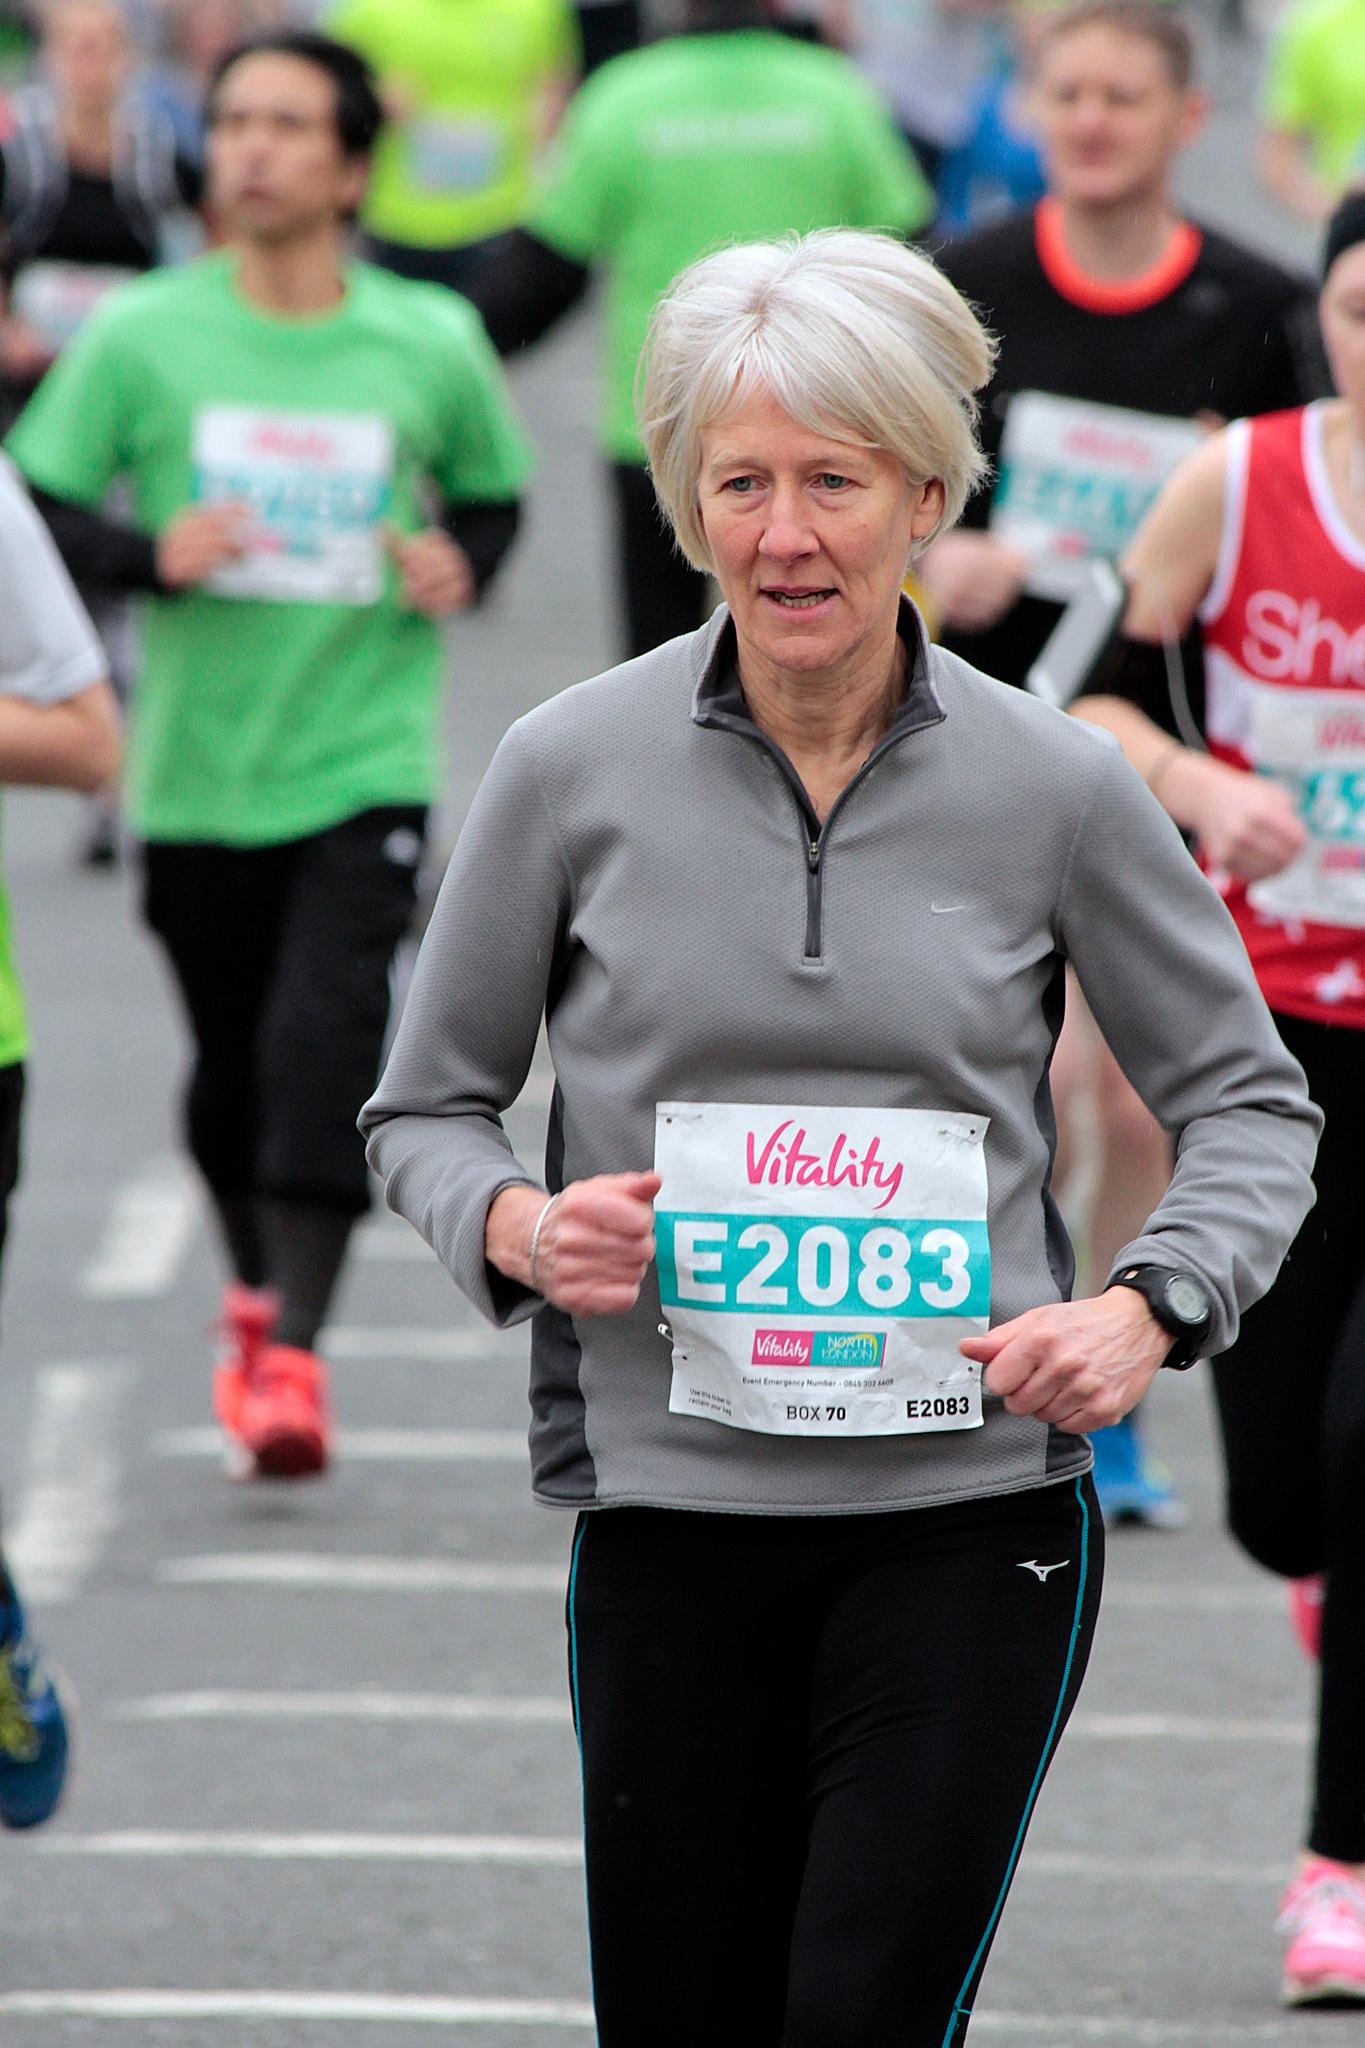 North London half maraton by Jaroslaw Wrona